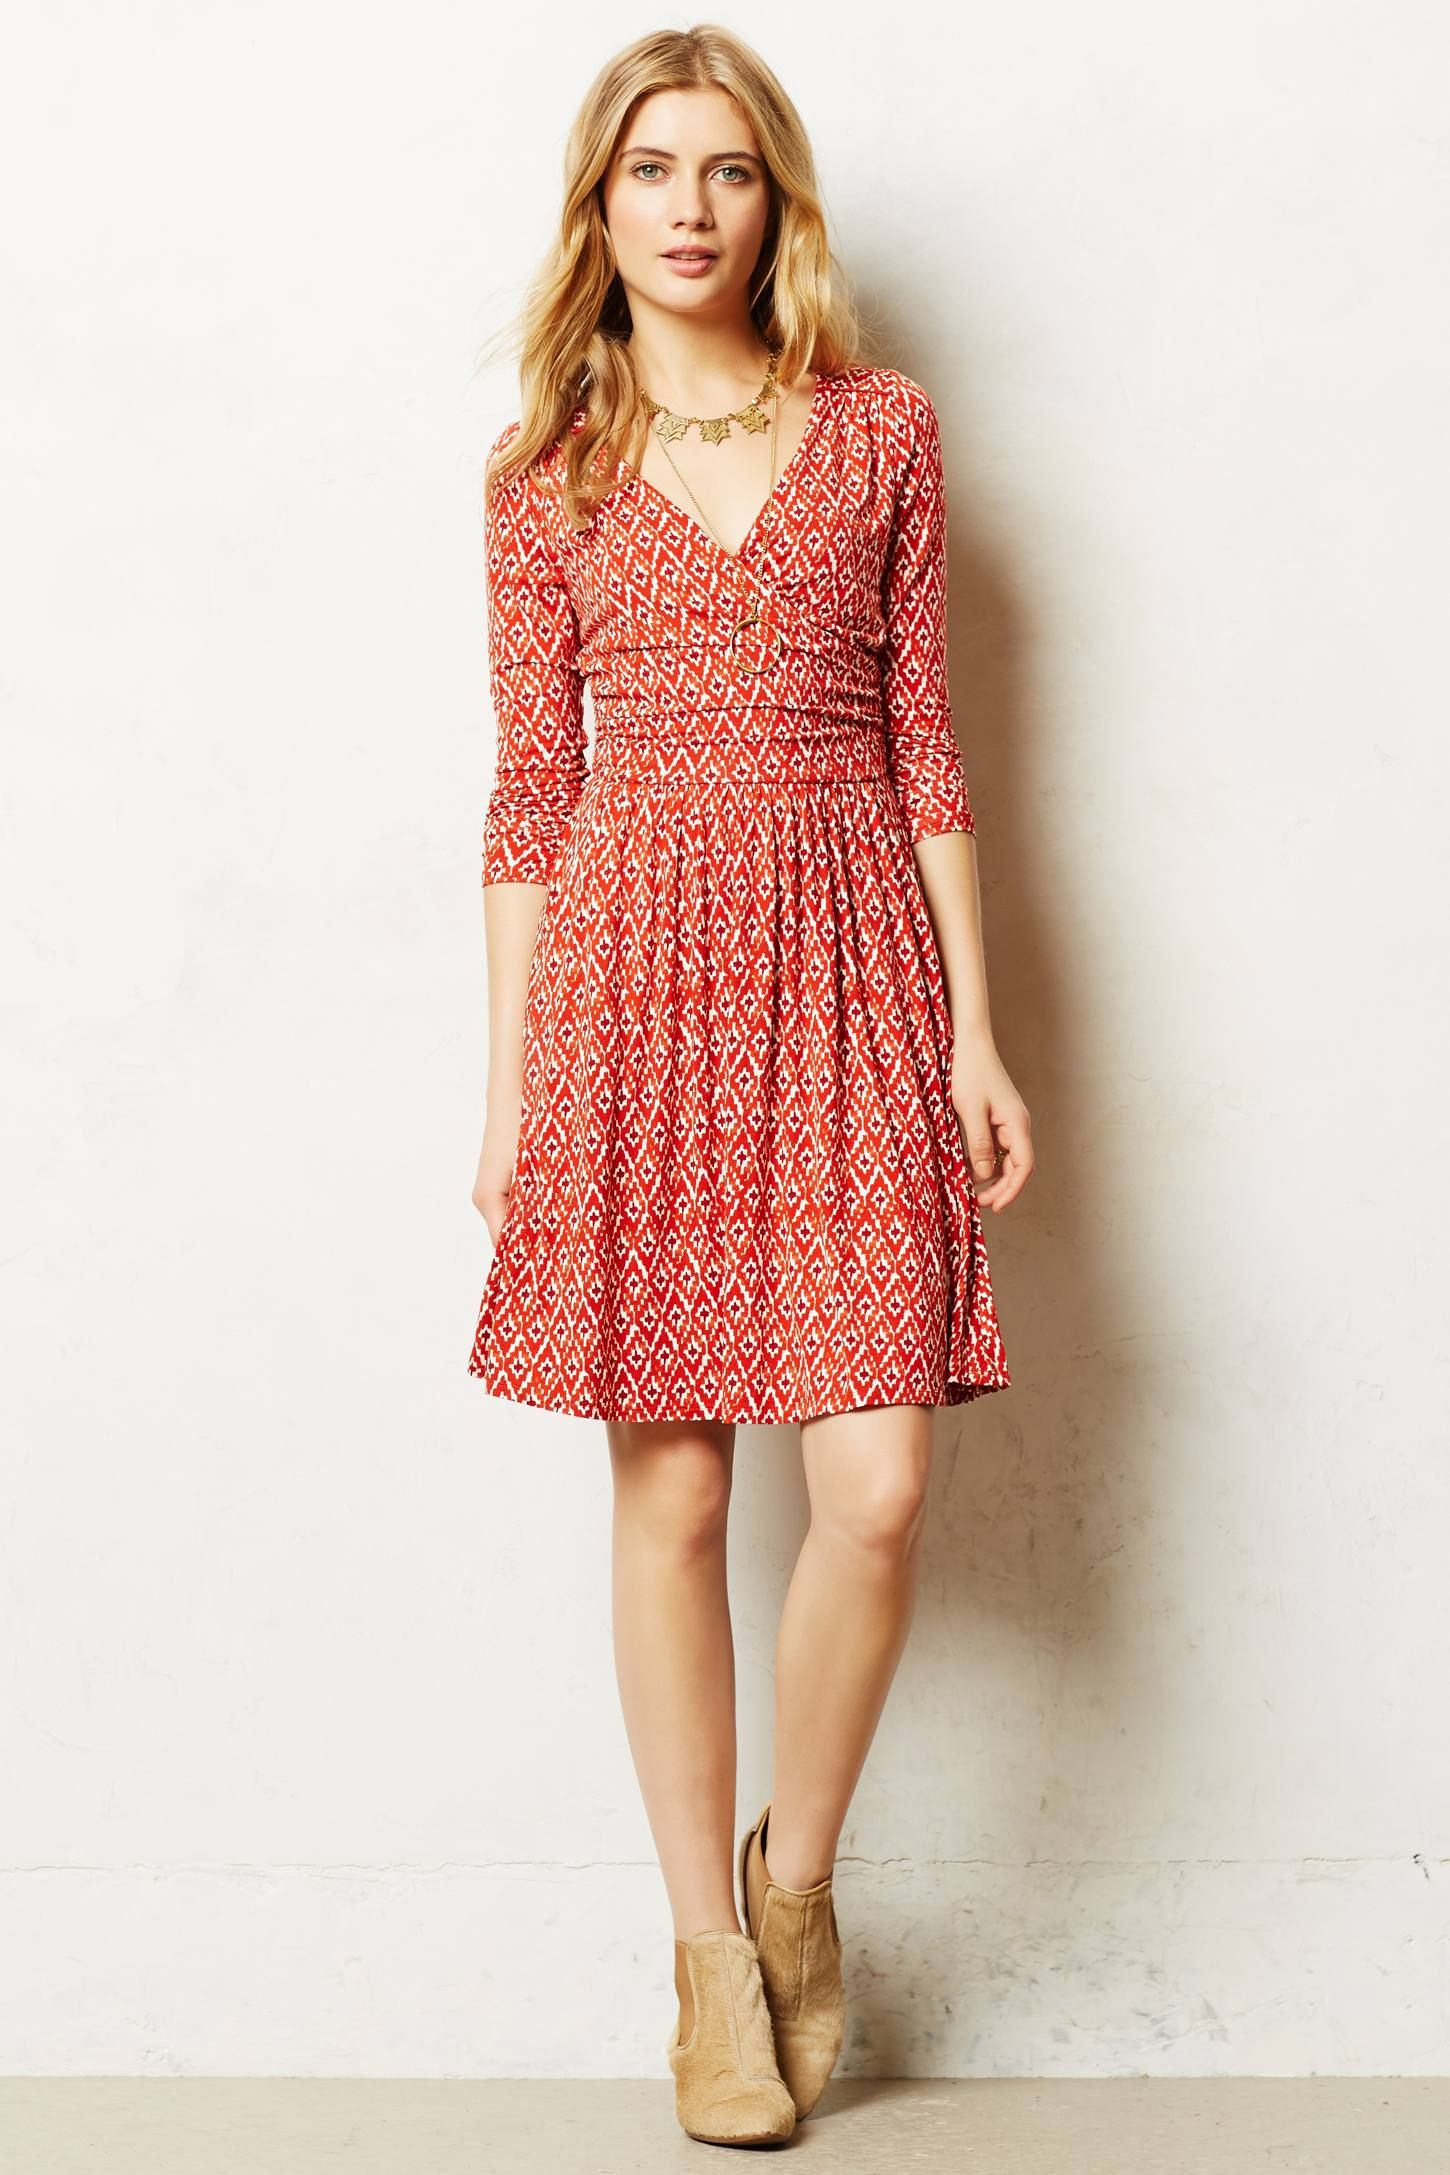 8d4f42264d93 Revelations Knitted Dress - anthropologie.eu | FASHION!!! | Kleider ...